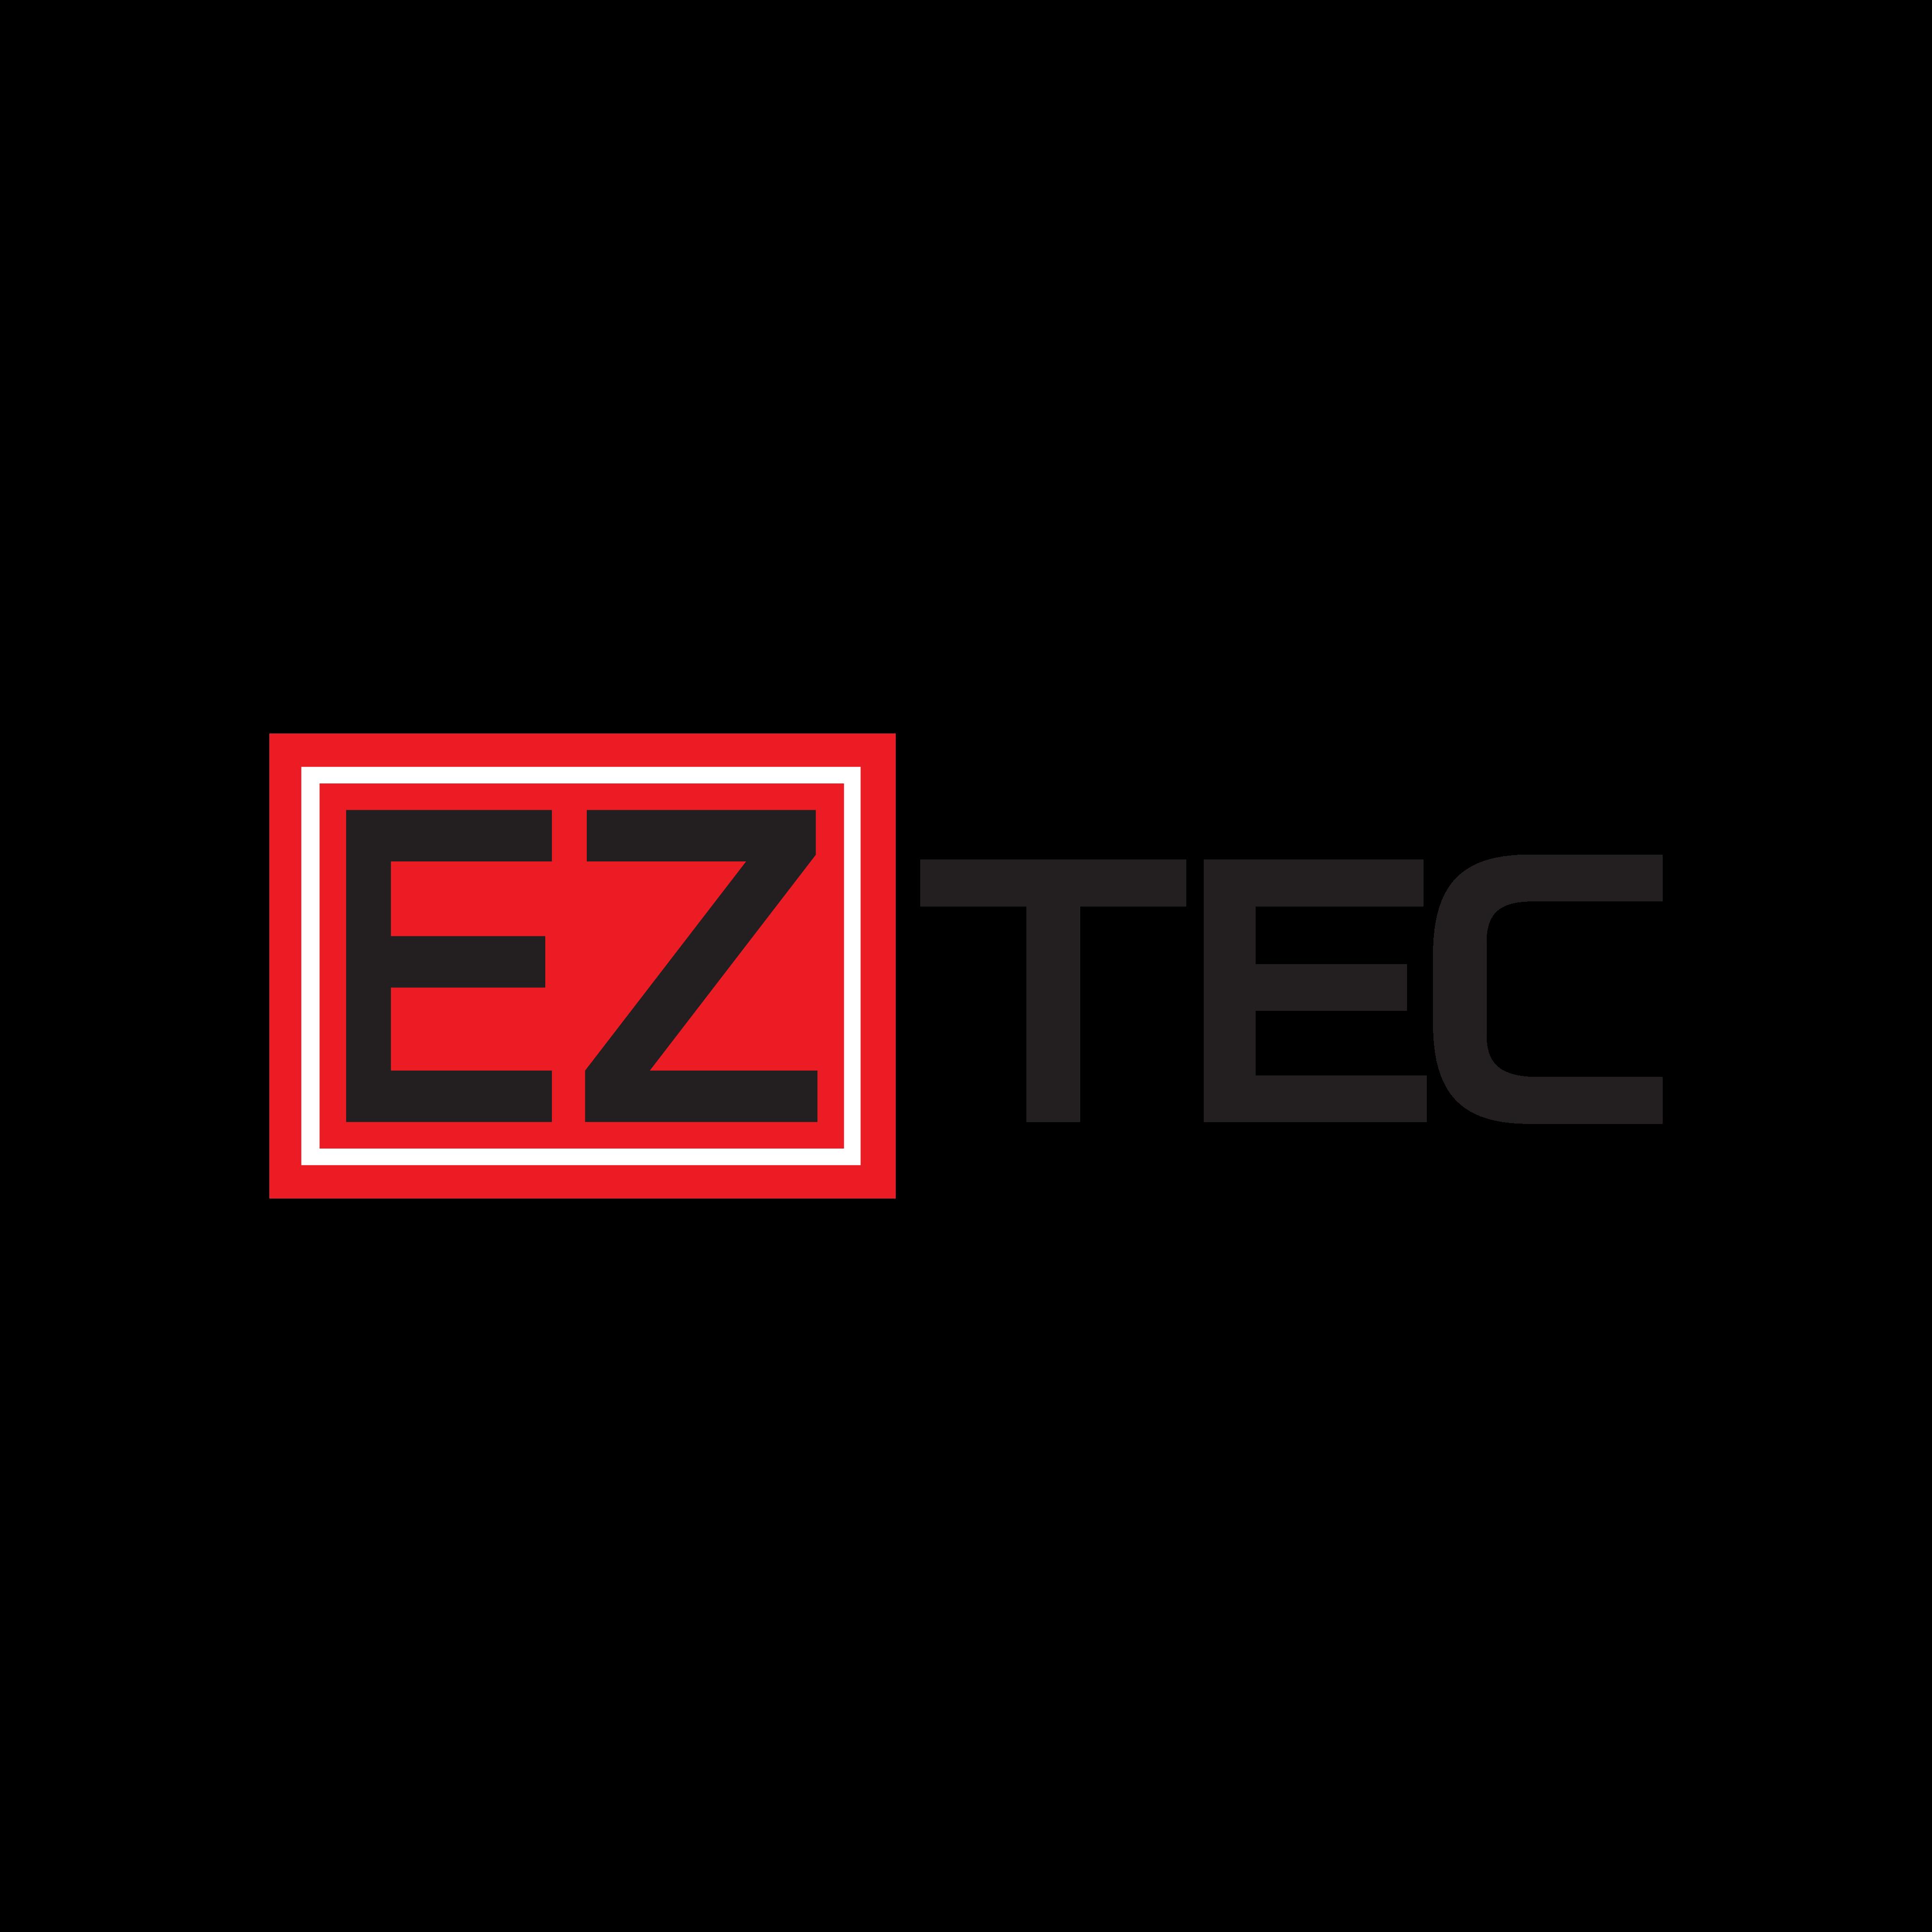 eztec logo 0 - Eztec Logo